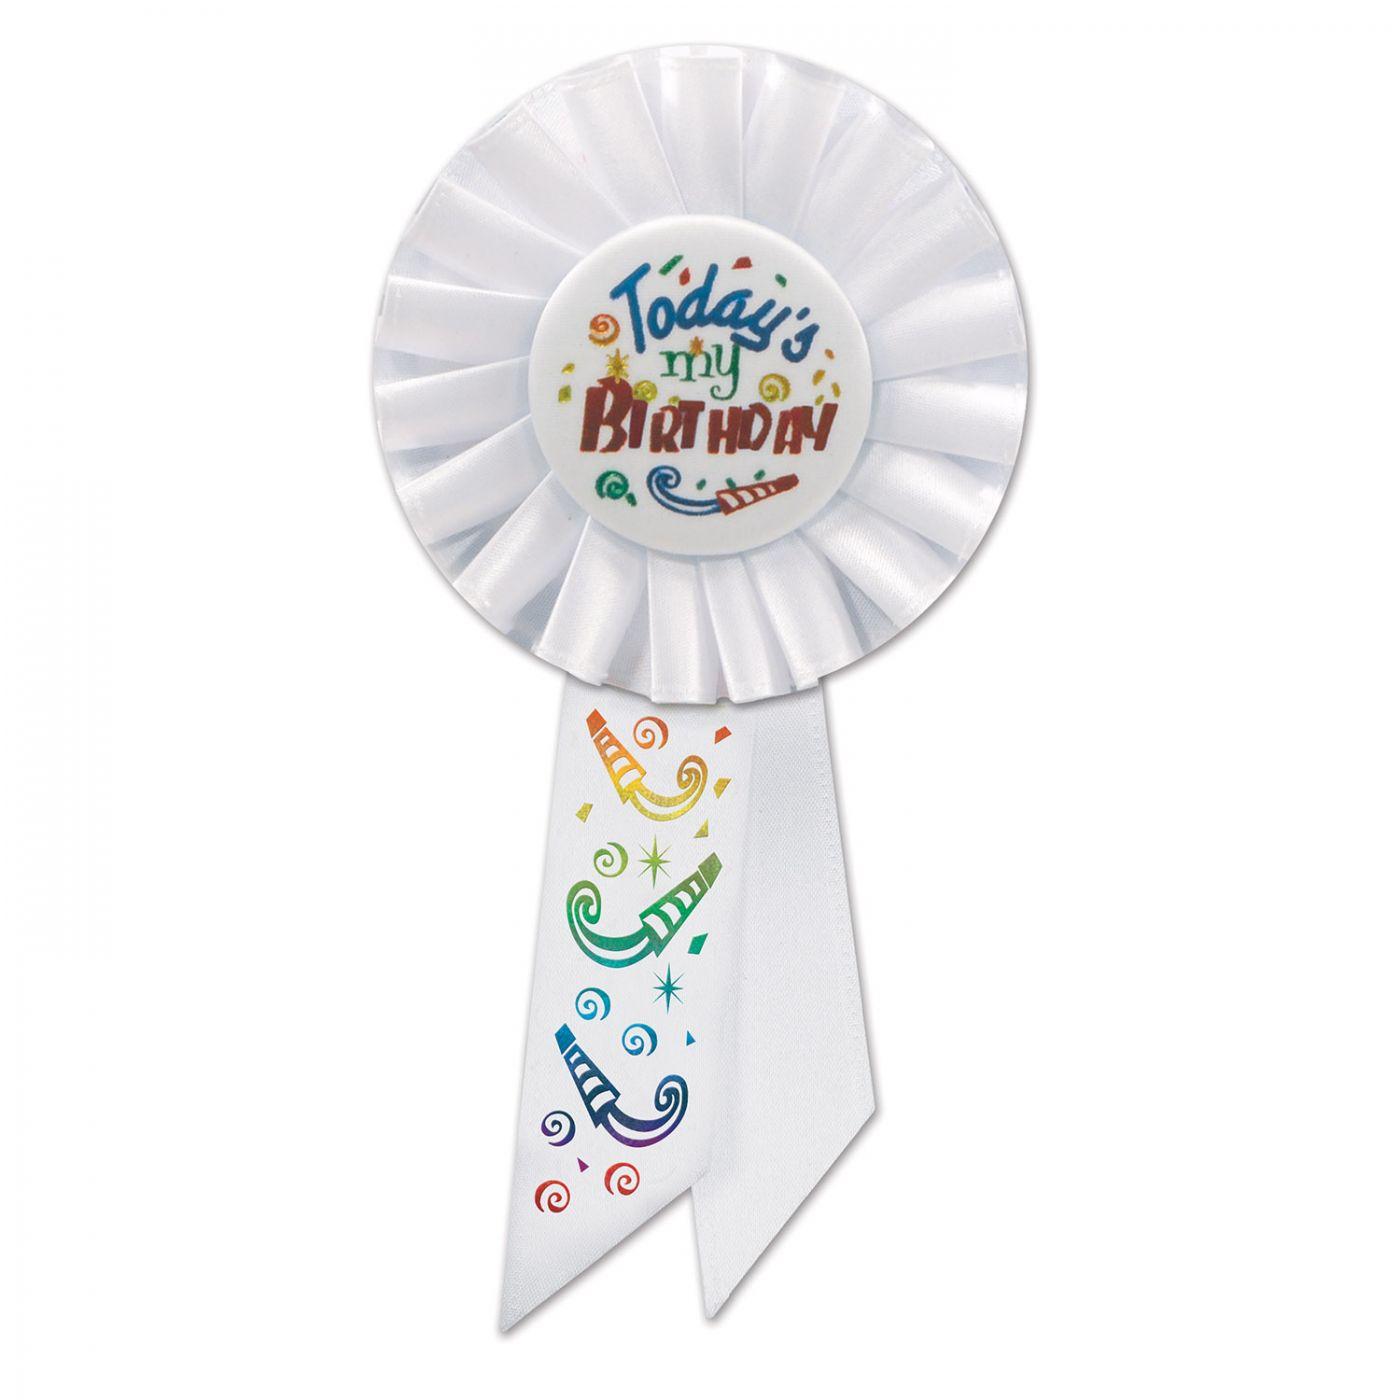 Today's My Birthday Rosette (6) image